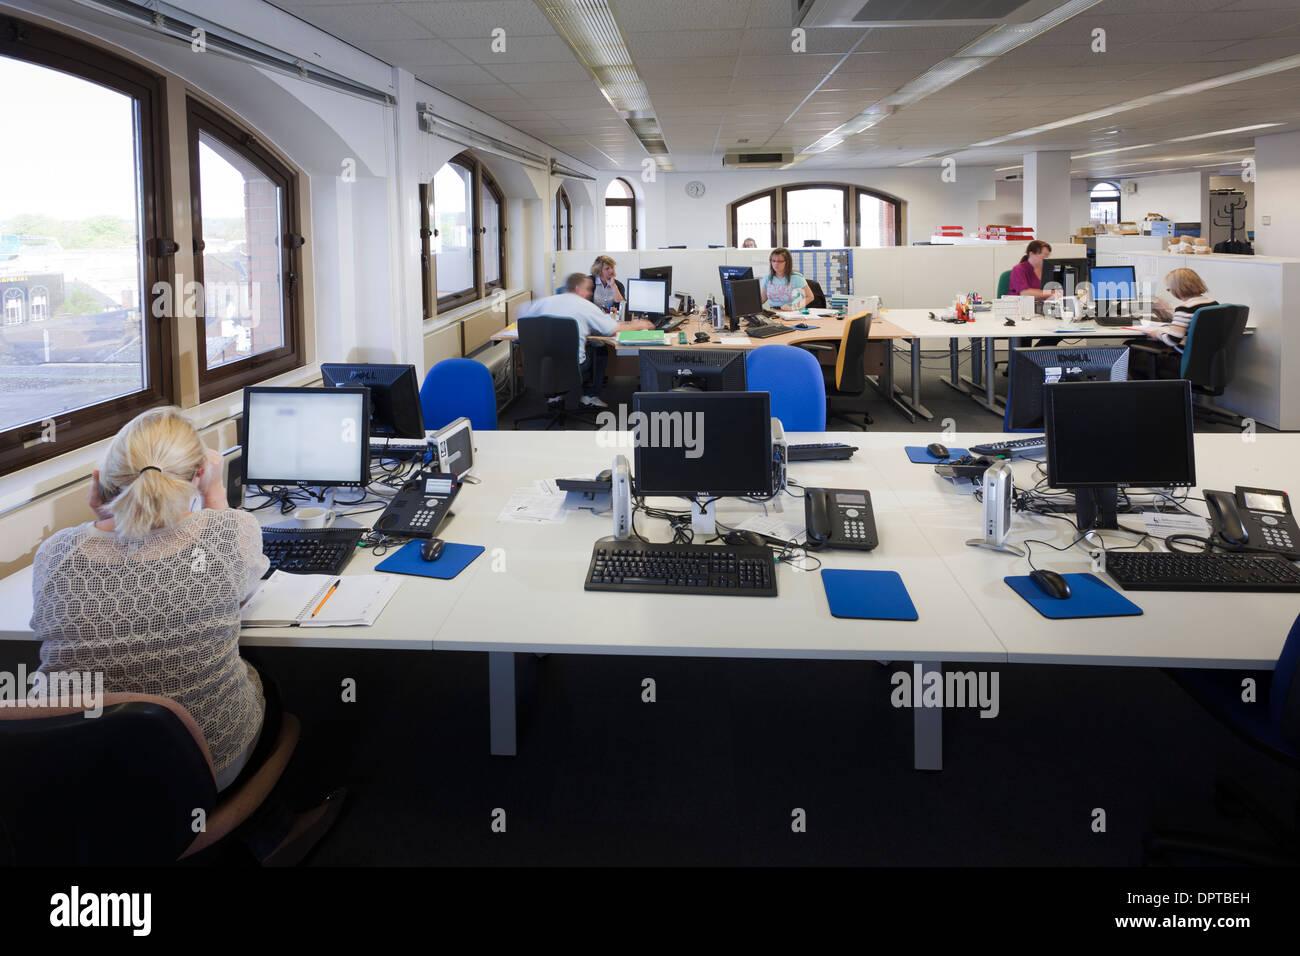 Open plan office interior. - Stock Image